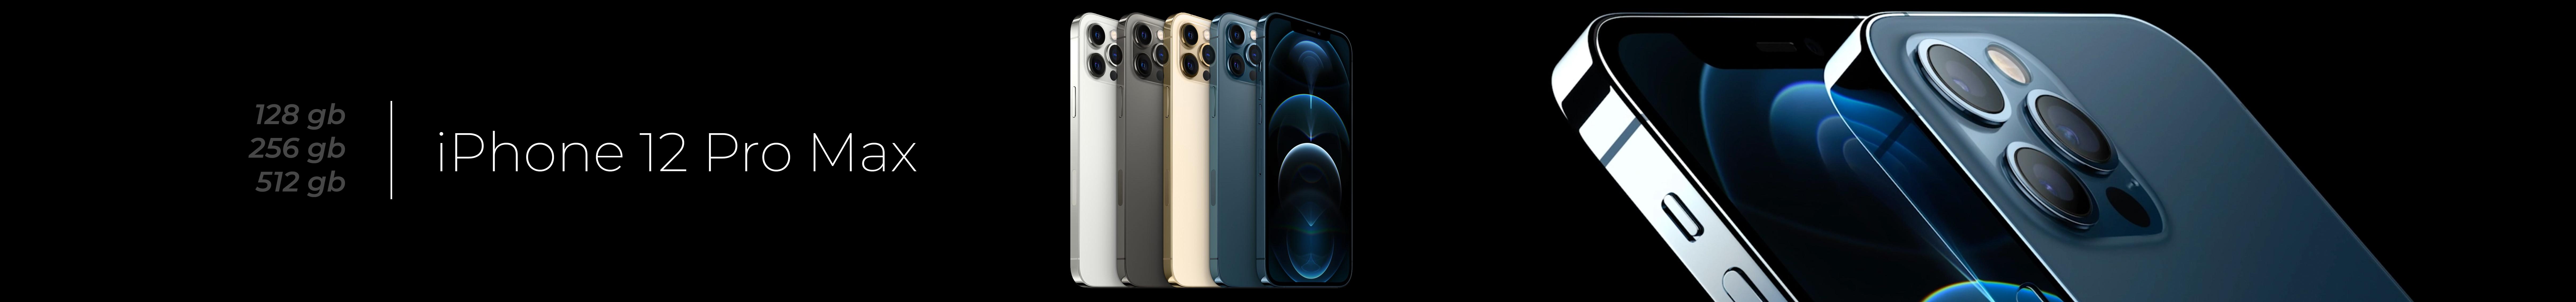 iPhone 12 Pro Max Open Box Mobile